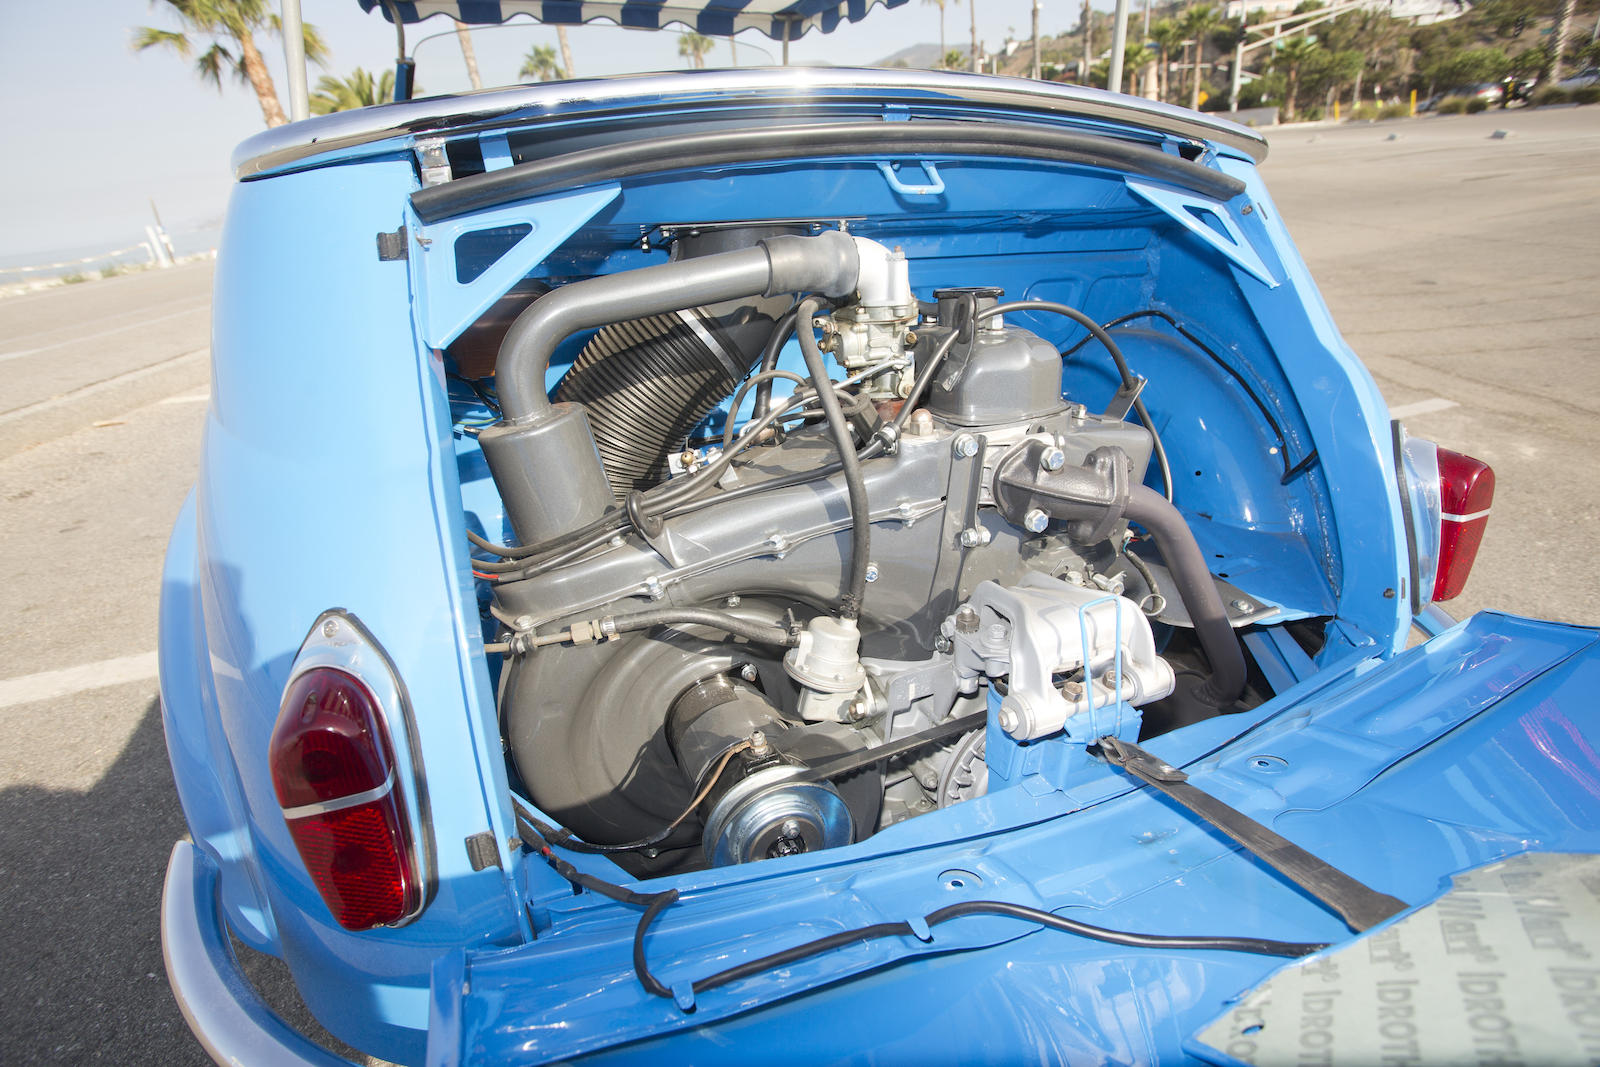 1959 Fiat Jolly engine